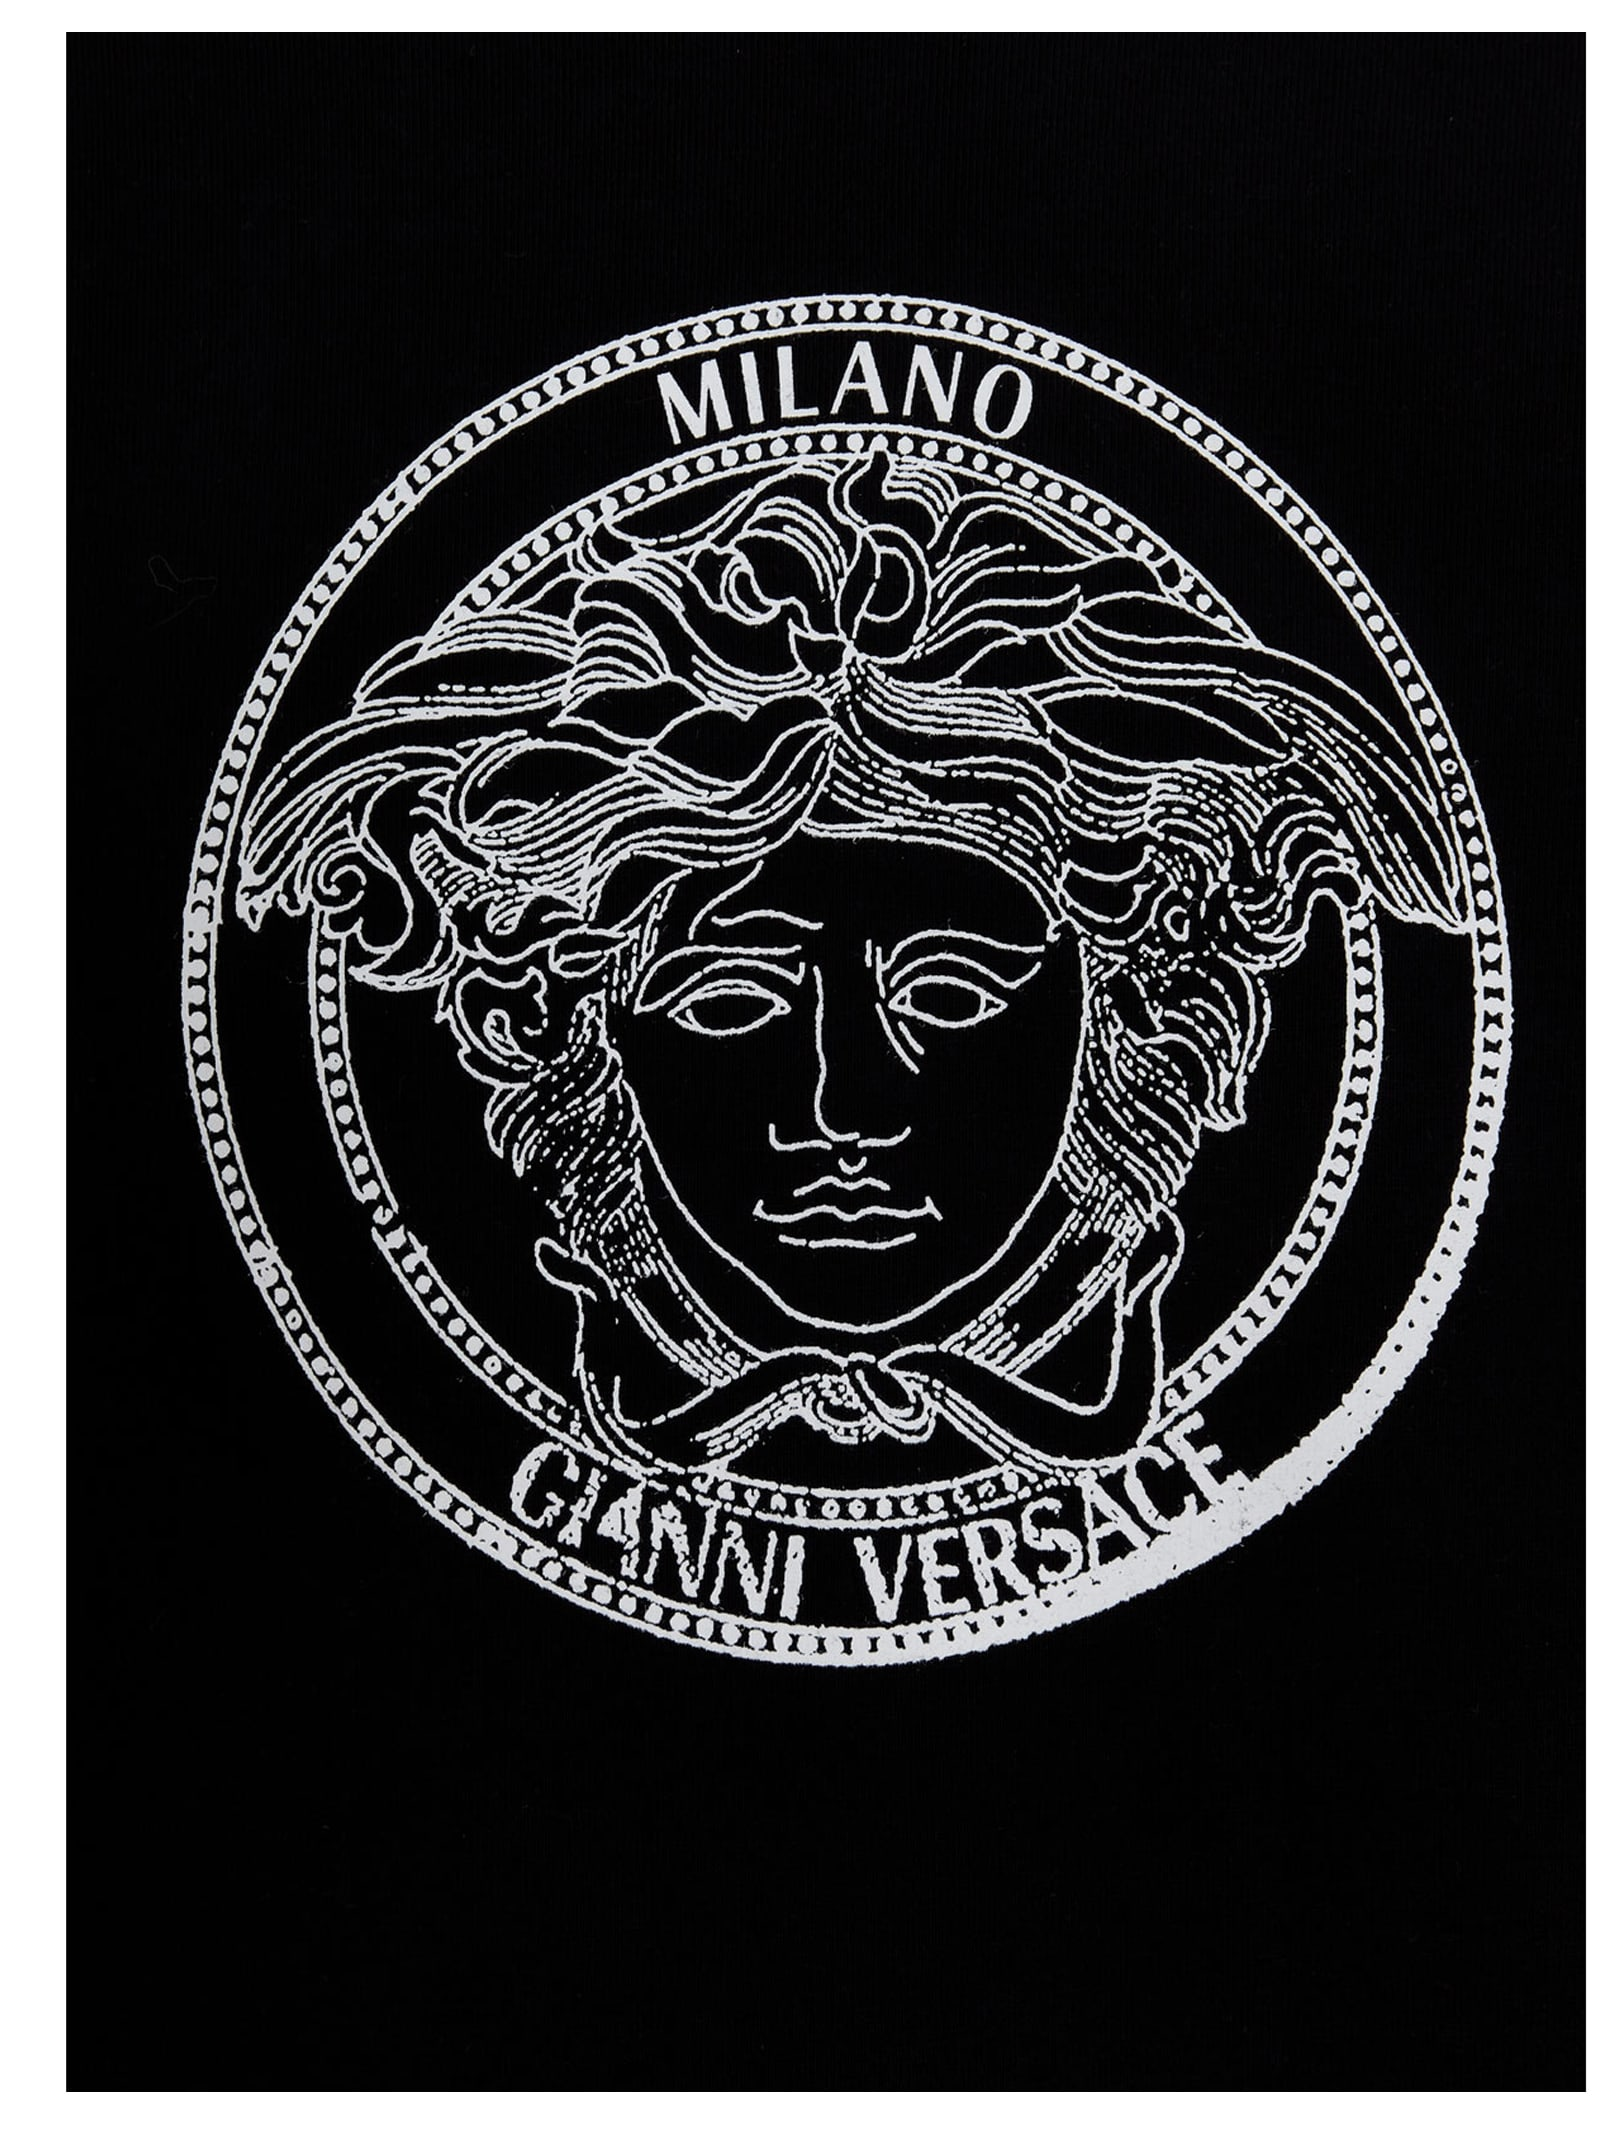 Fashion Style Versace 'medusa' Hoodie - Top Quality